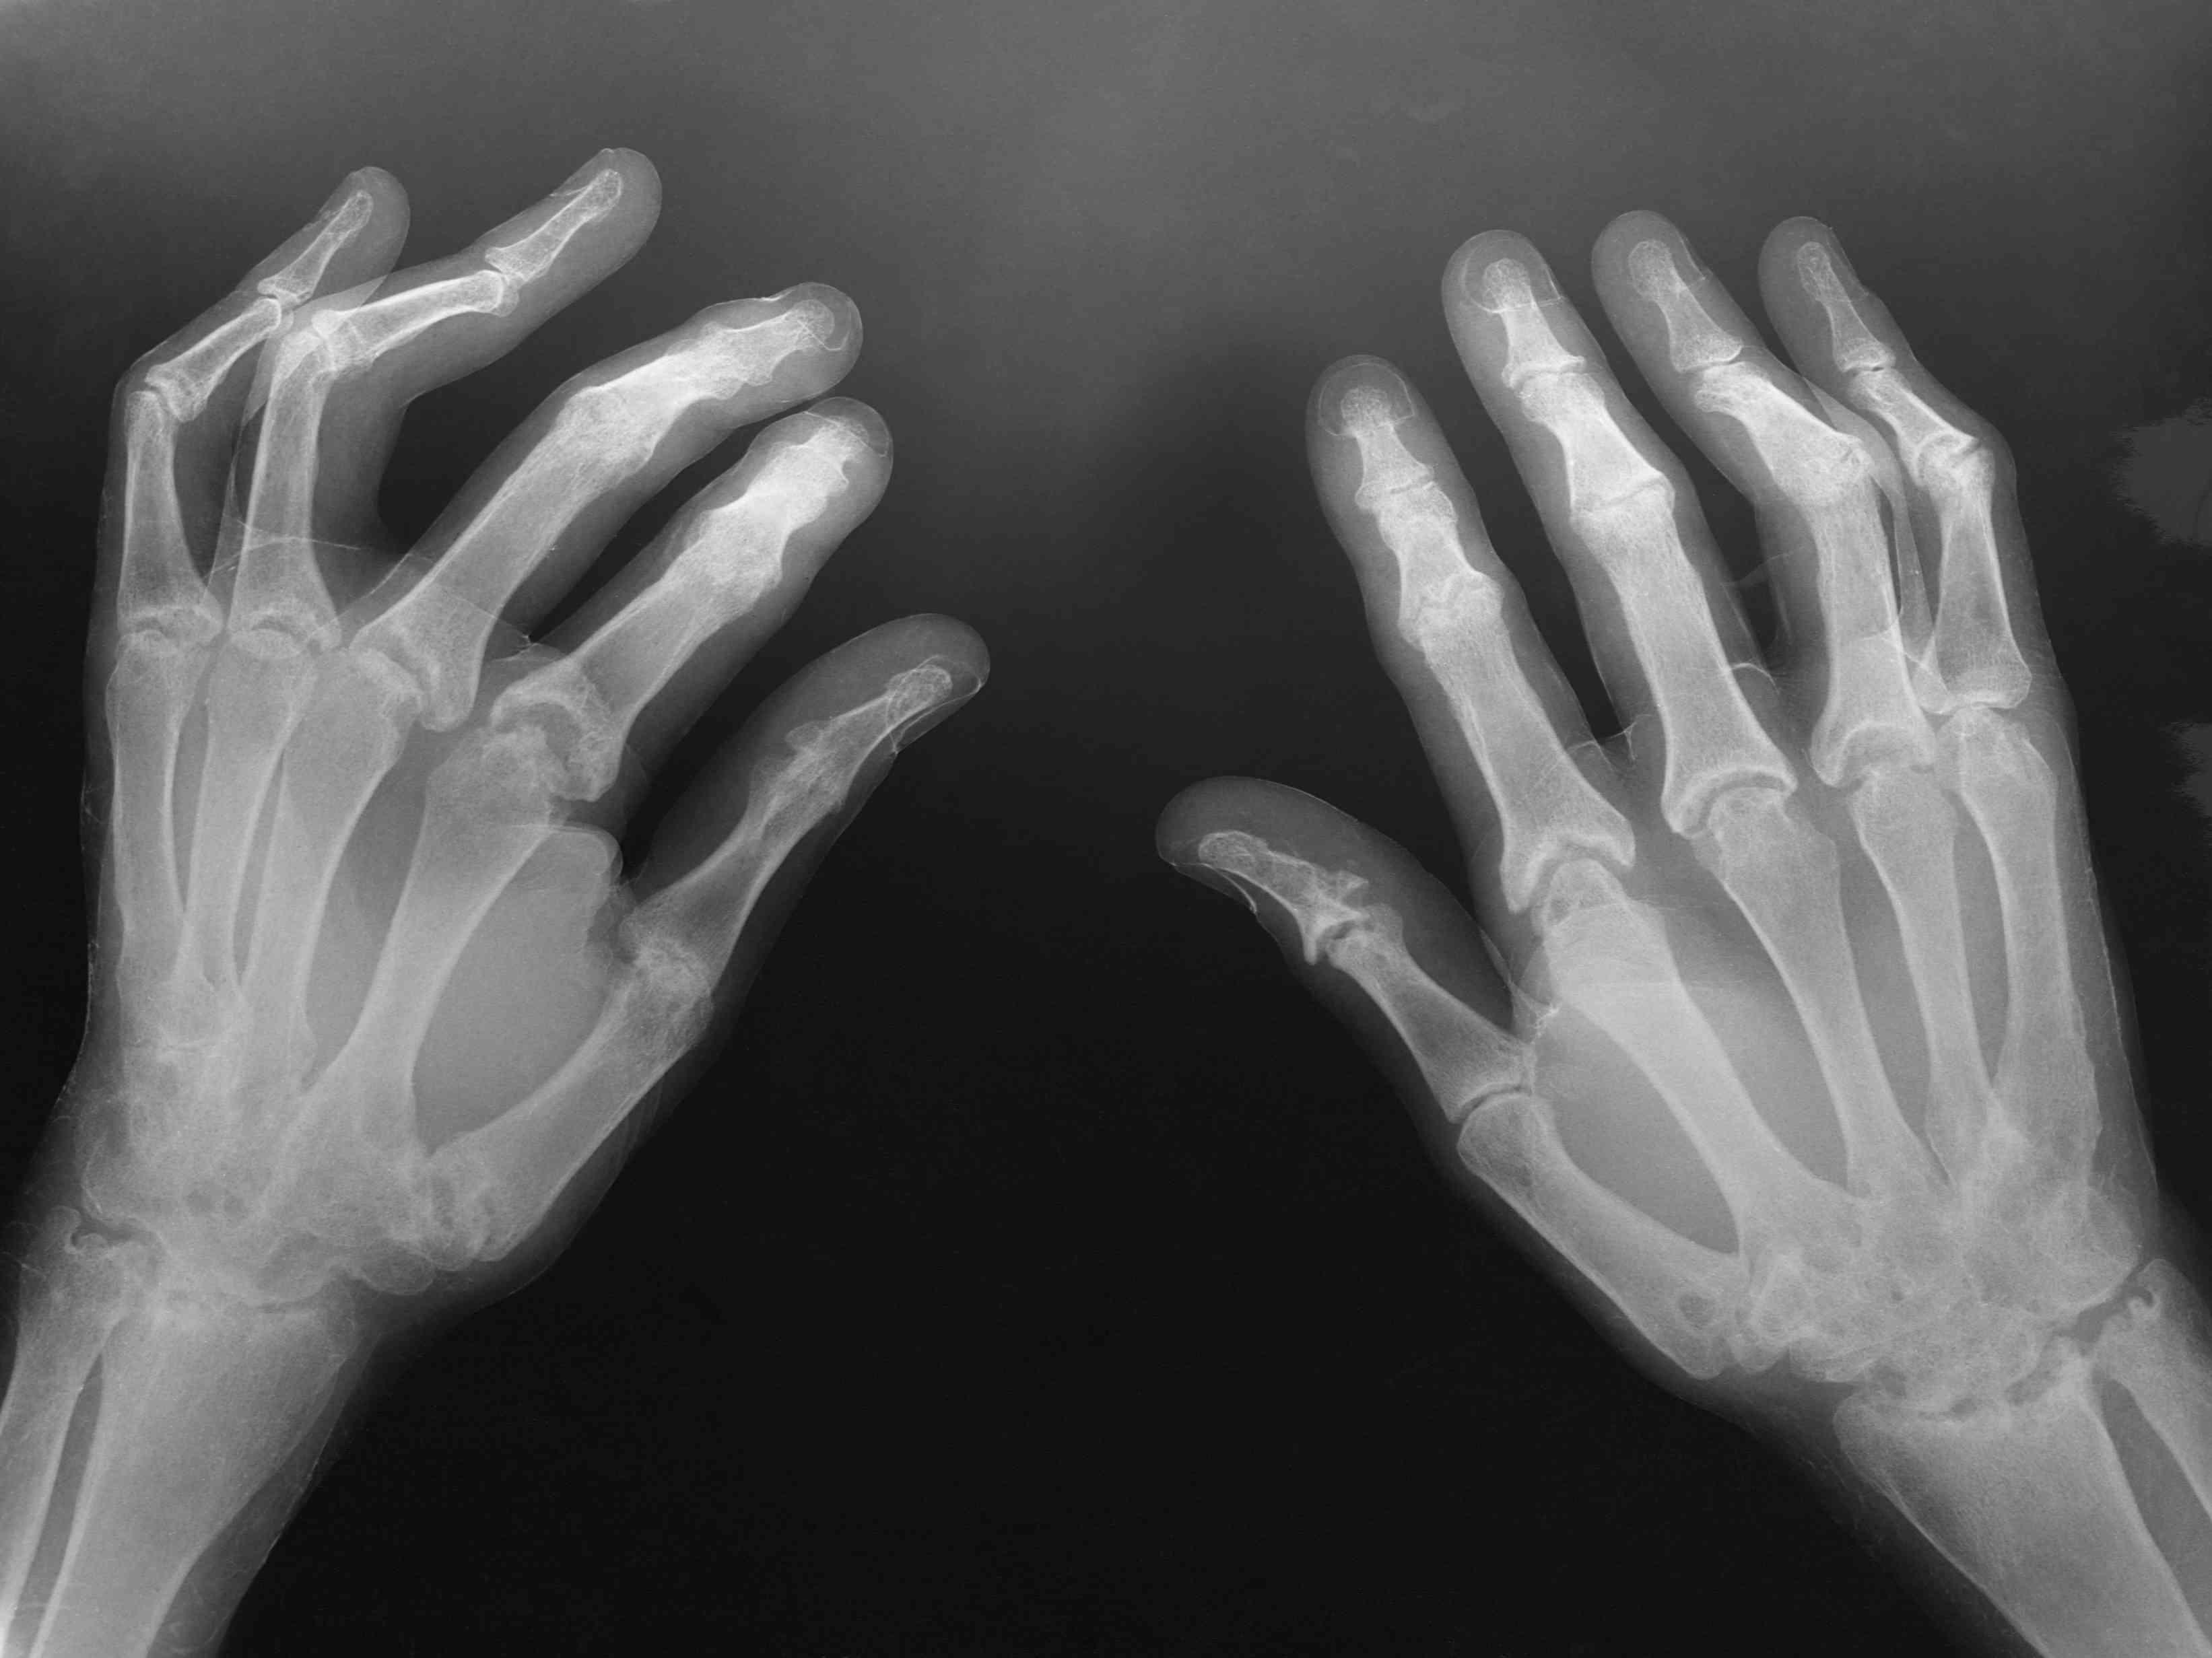 Osteoarthritis in the hands